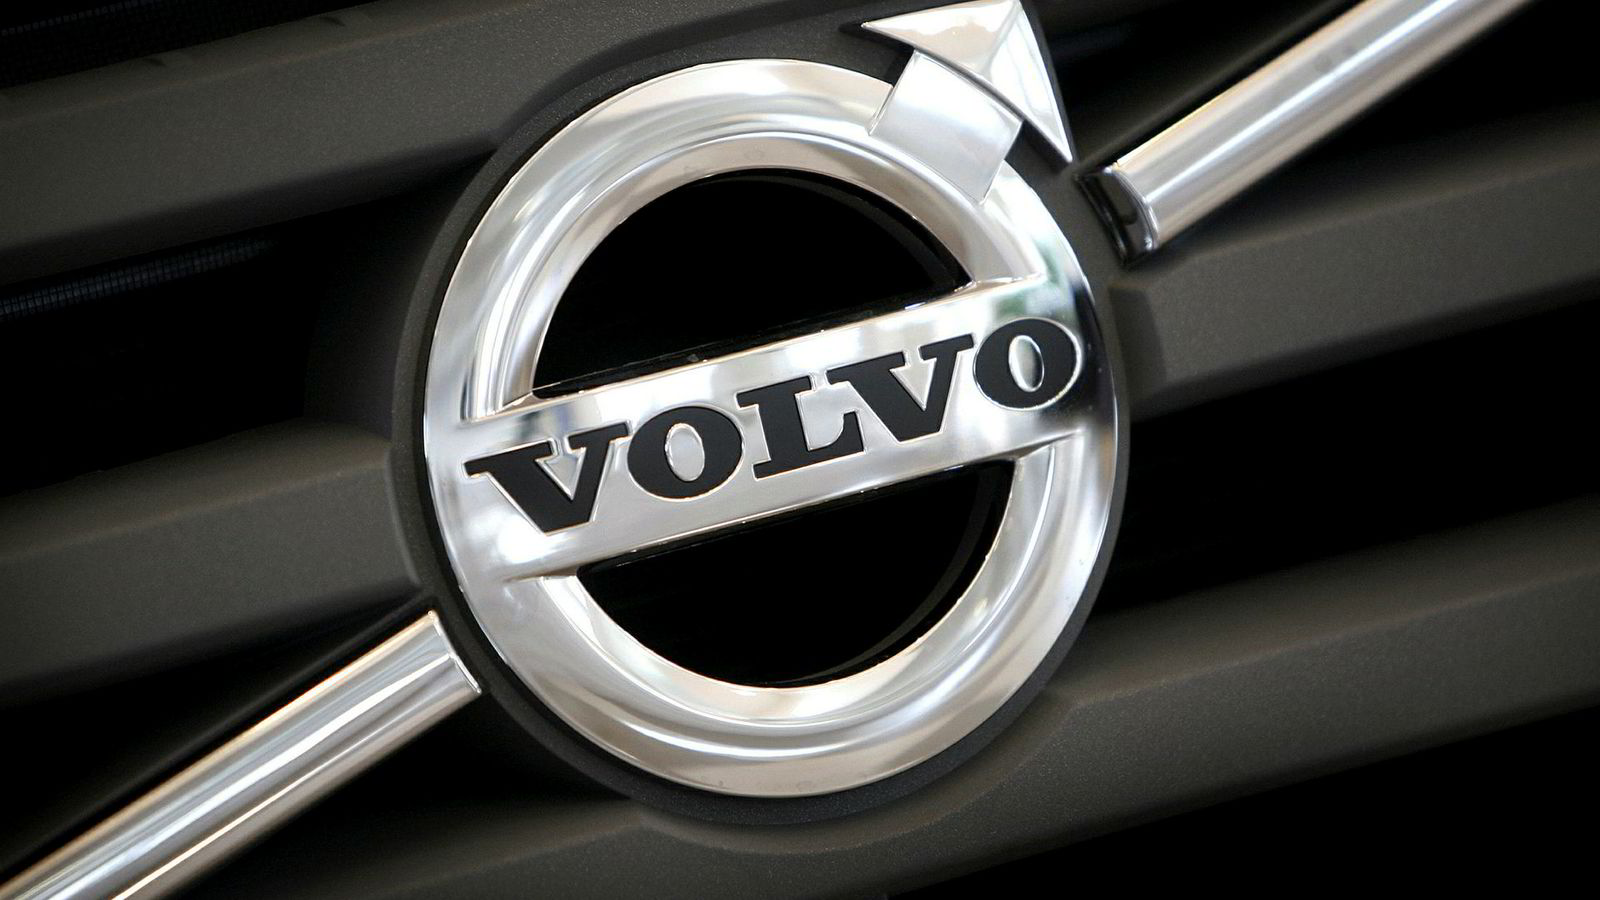 Nox-trøbbel skaper hodebry for Volvo